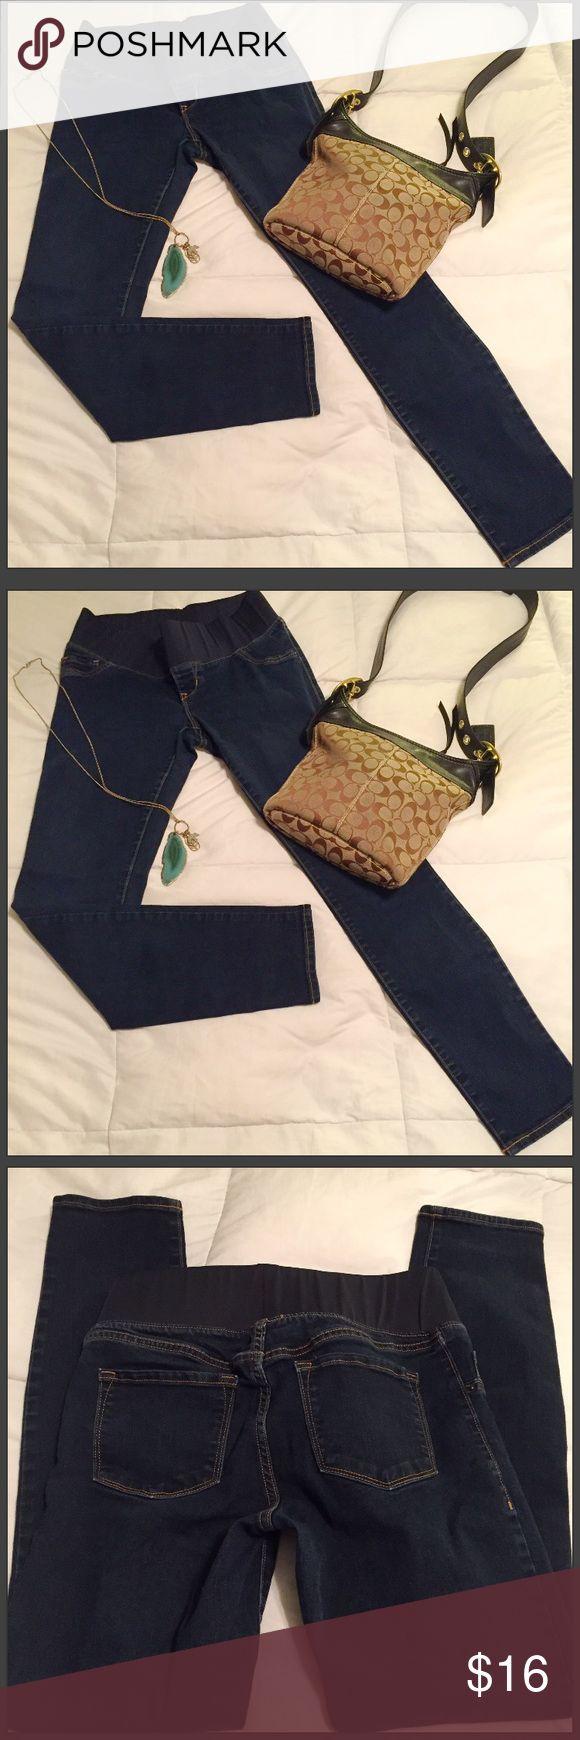 "Old navy maternity jeans 👖 size 6 Old navy maternity jeans 👖 size 6 excellent condition 29"" inseam. Old Navy Jeans Skinny"